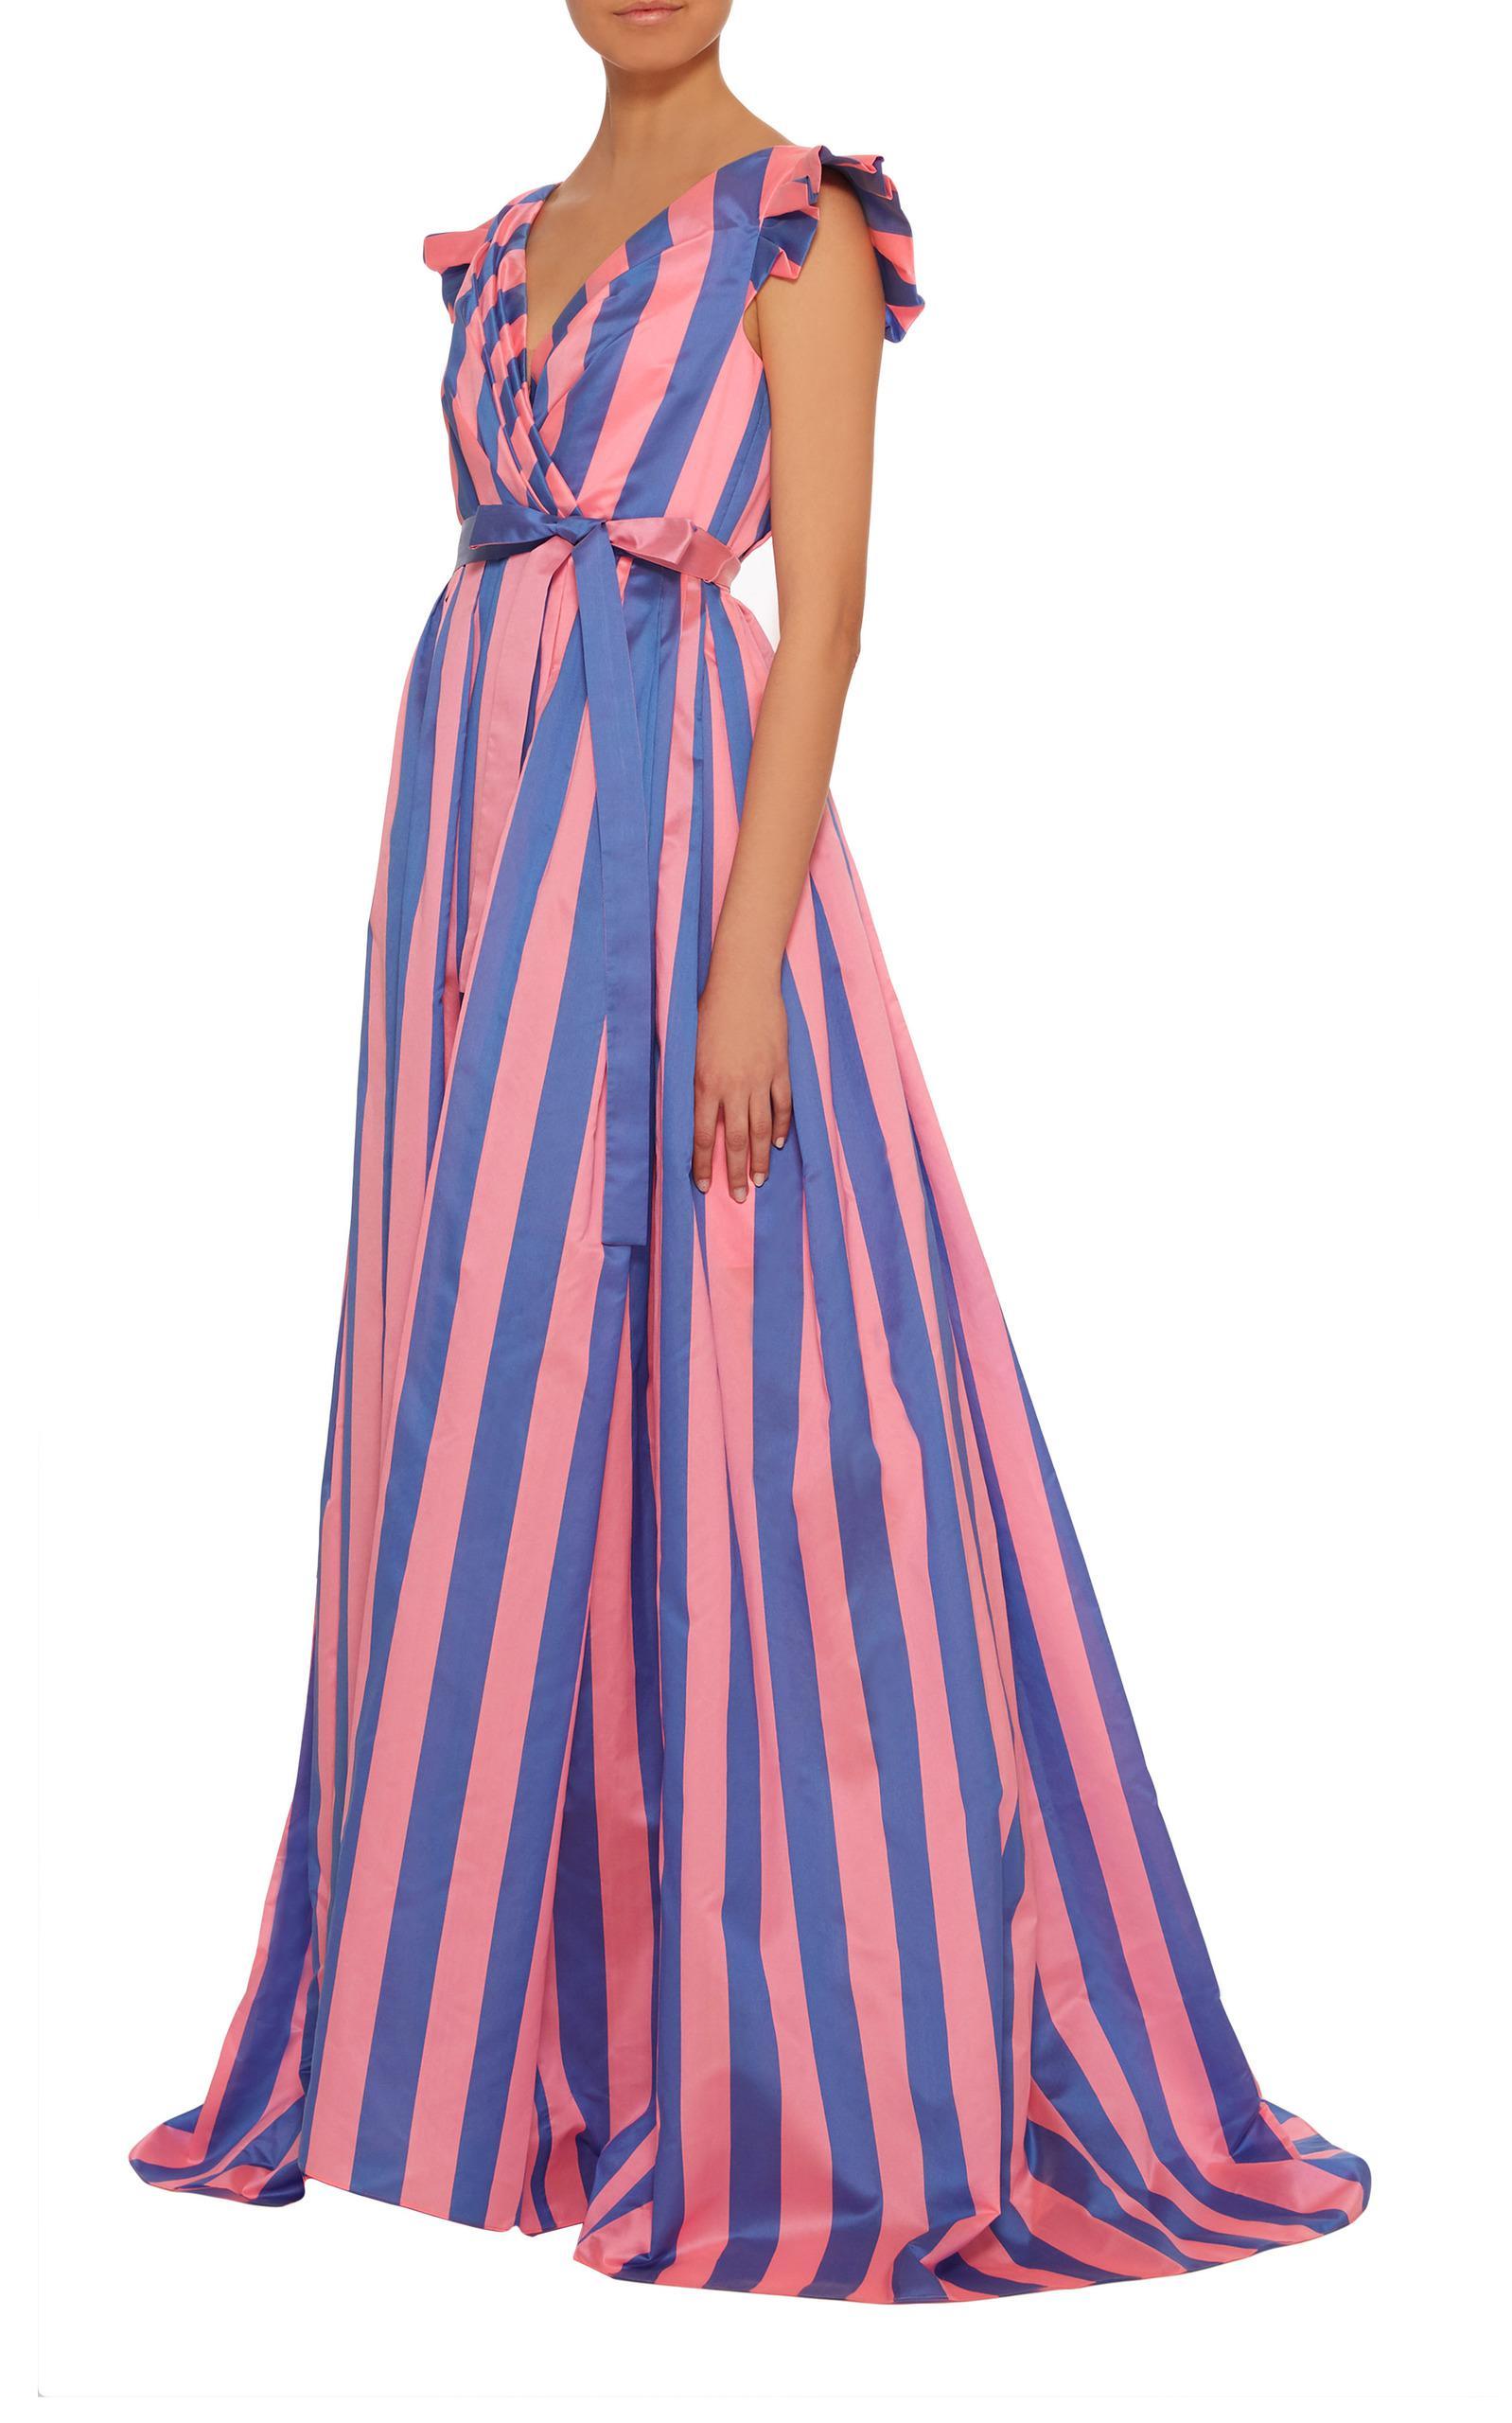 Carolina Herrera Silk Striped Taffeta Ball Gown in Blue